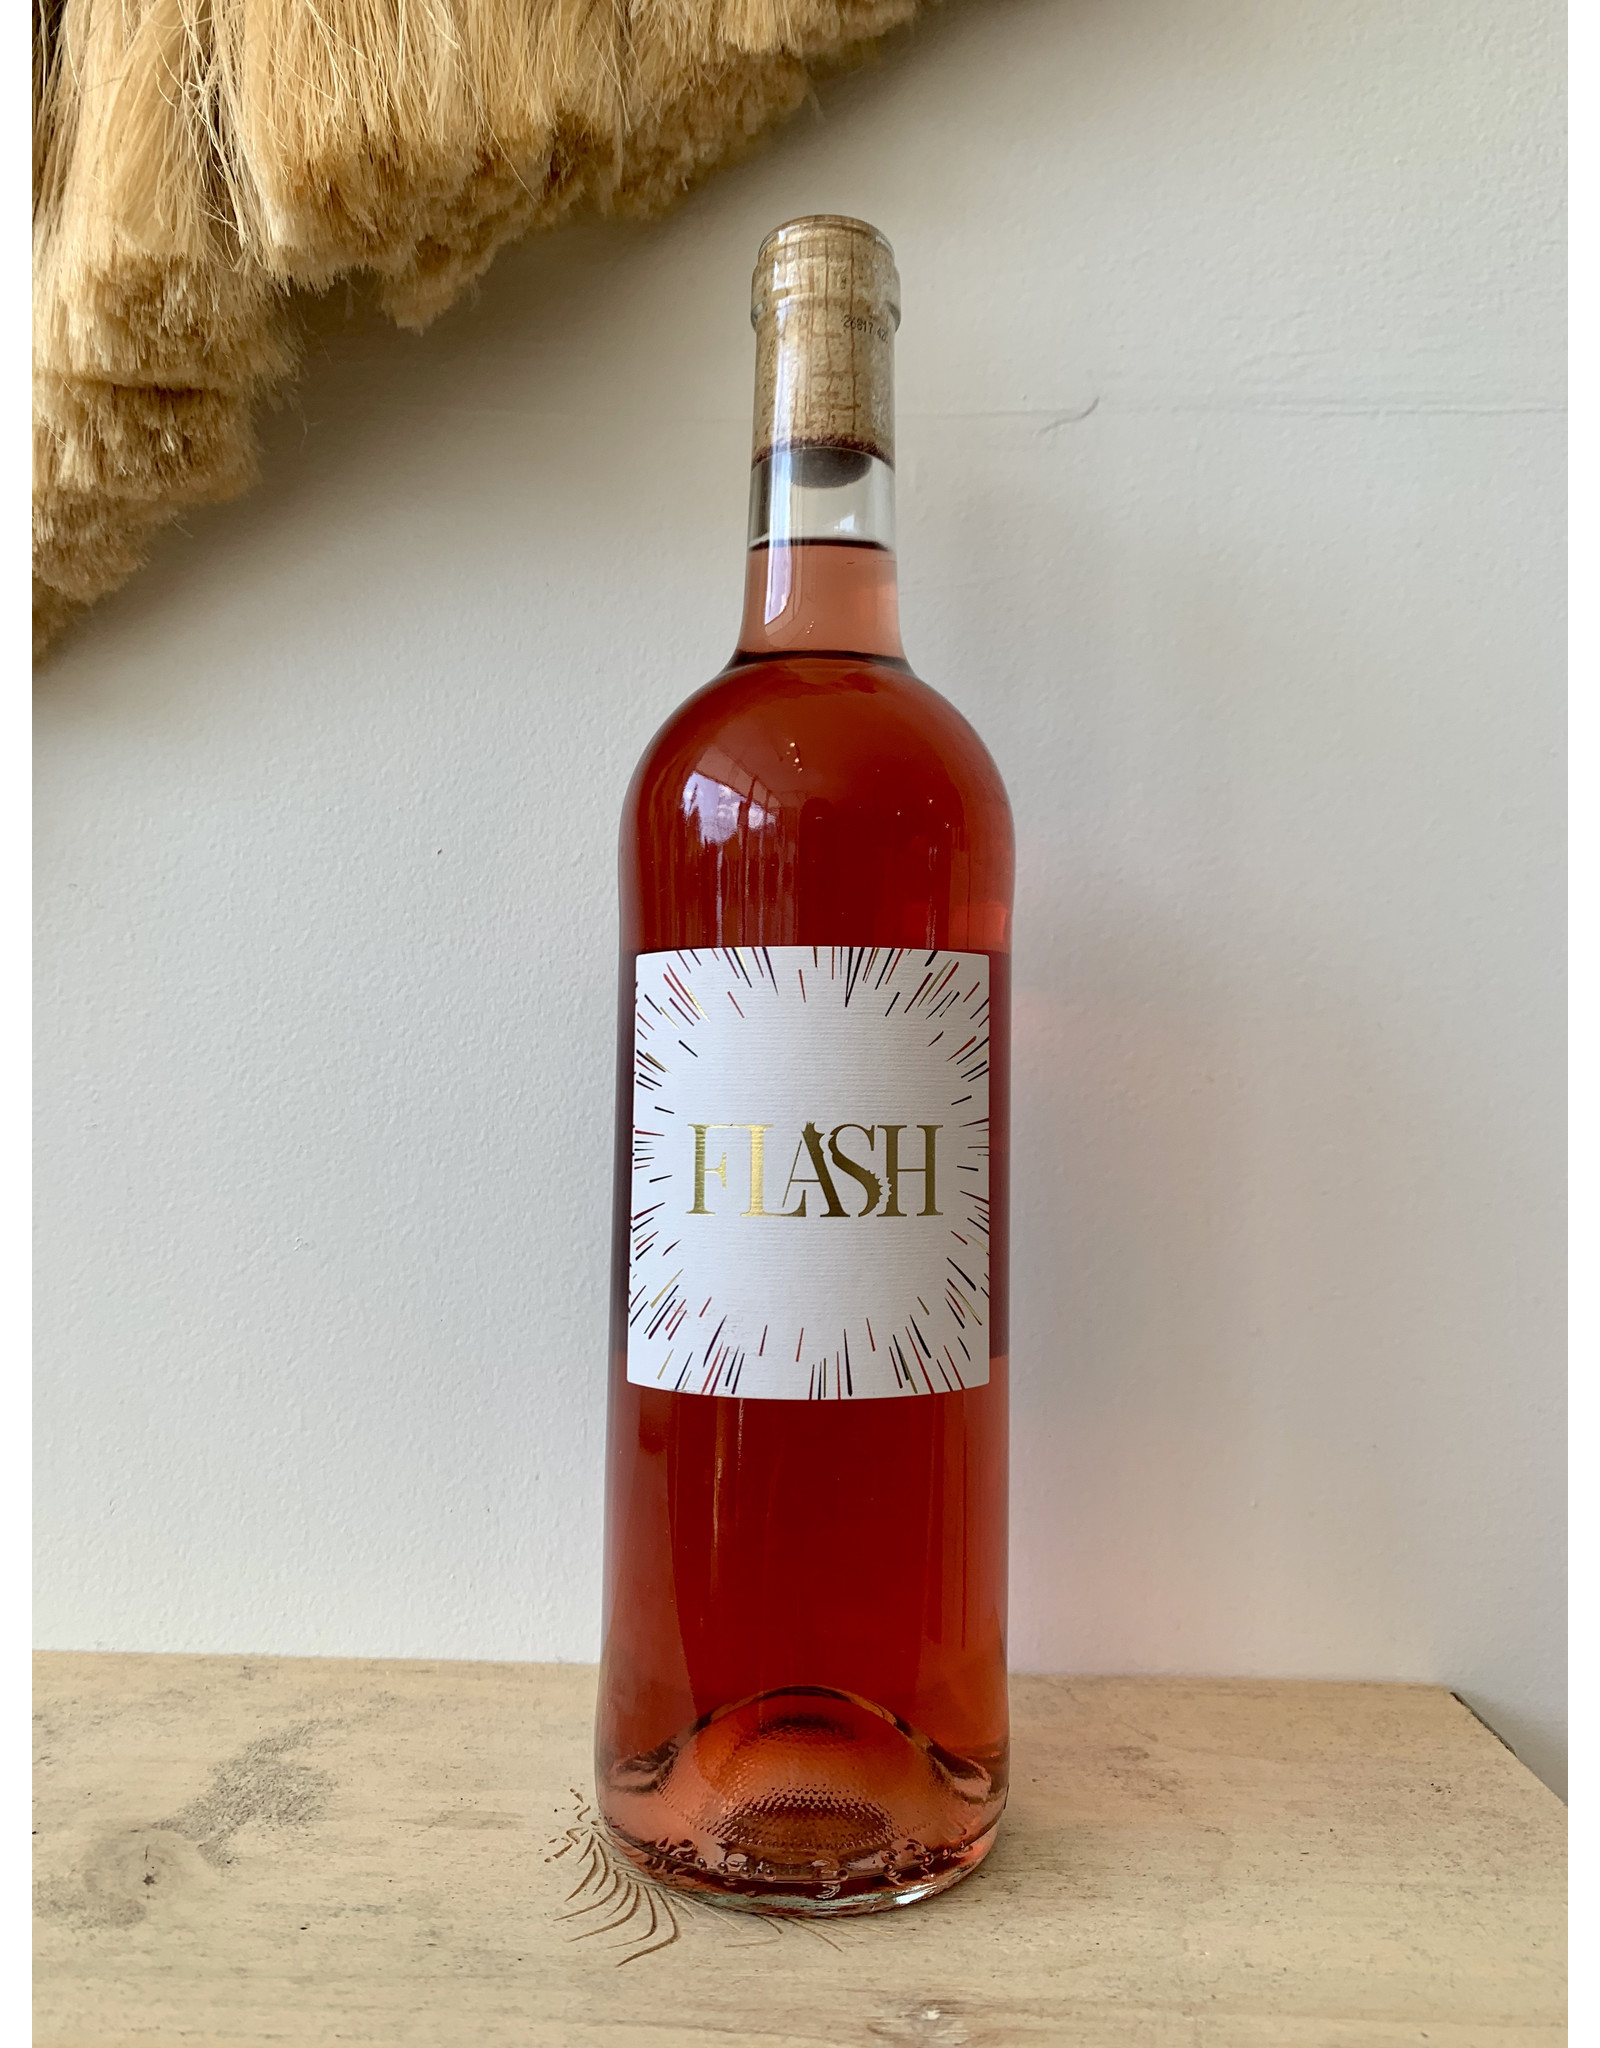 Negrón & Rolich FLASH Rosé 2019